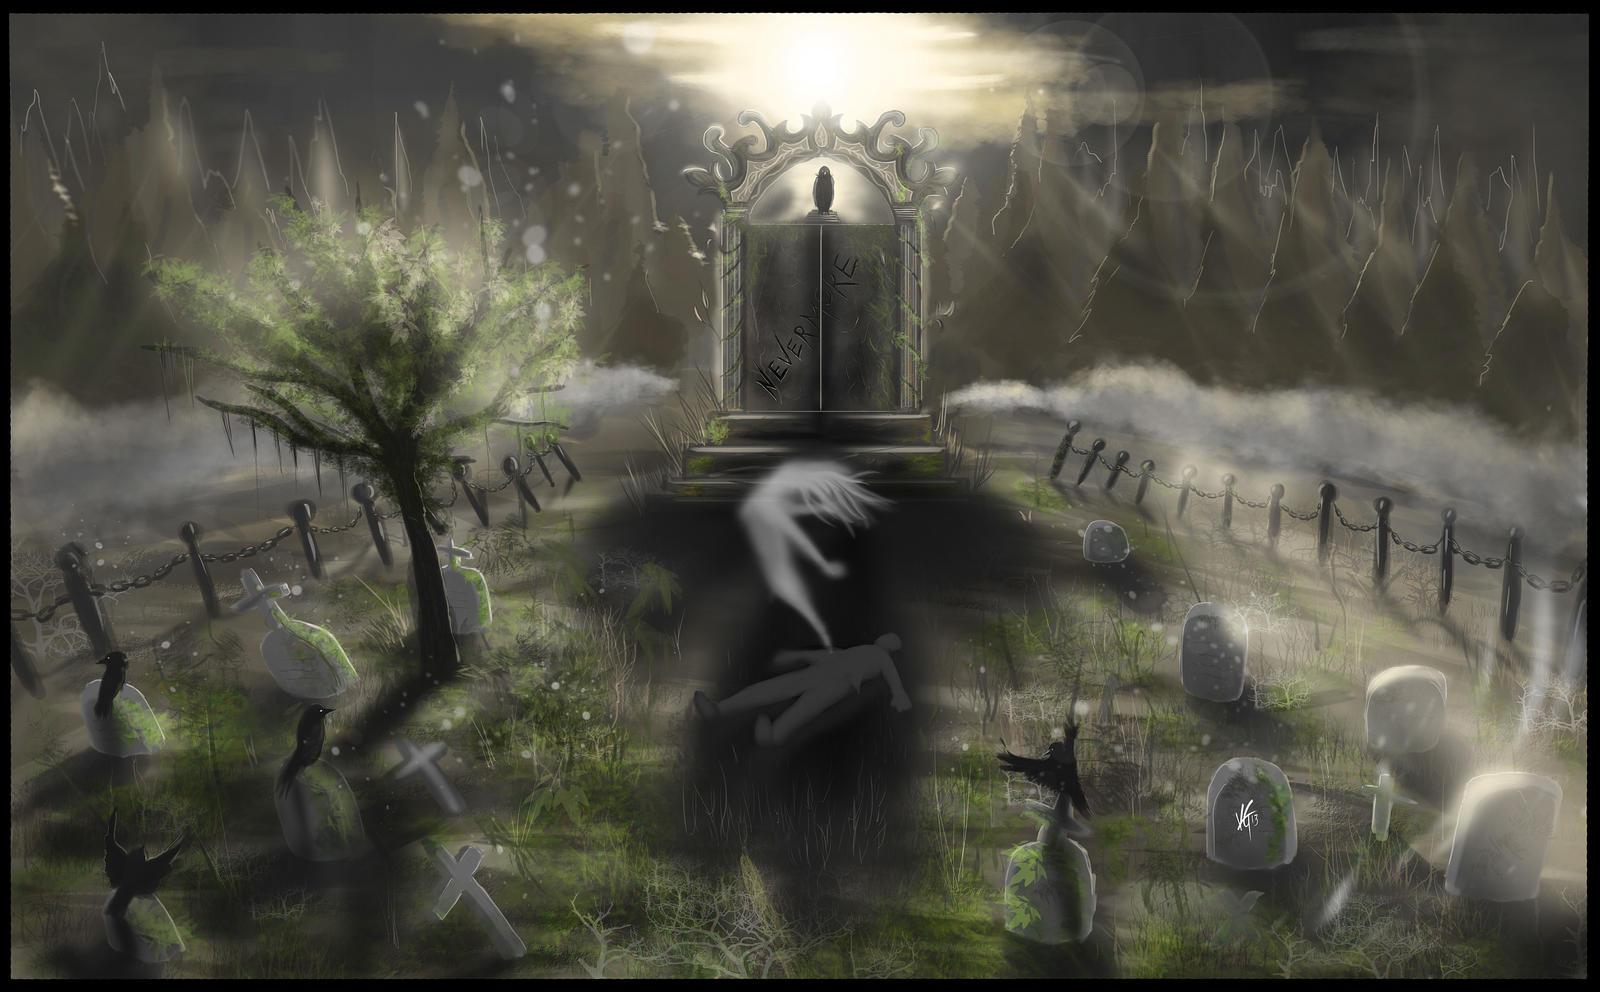 the raven edgar allan poe by kxg witcher on the raven edgar allan poe by kxg witcher